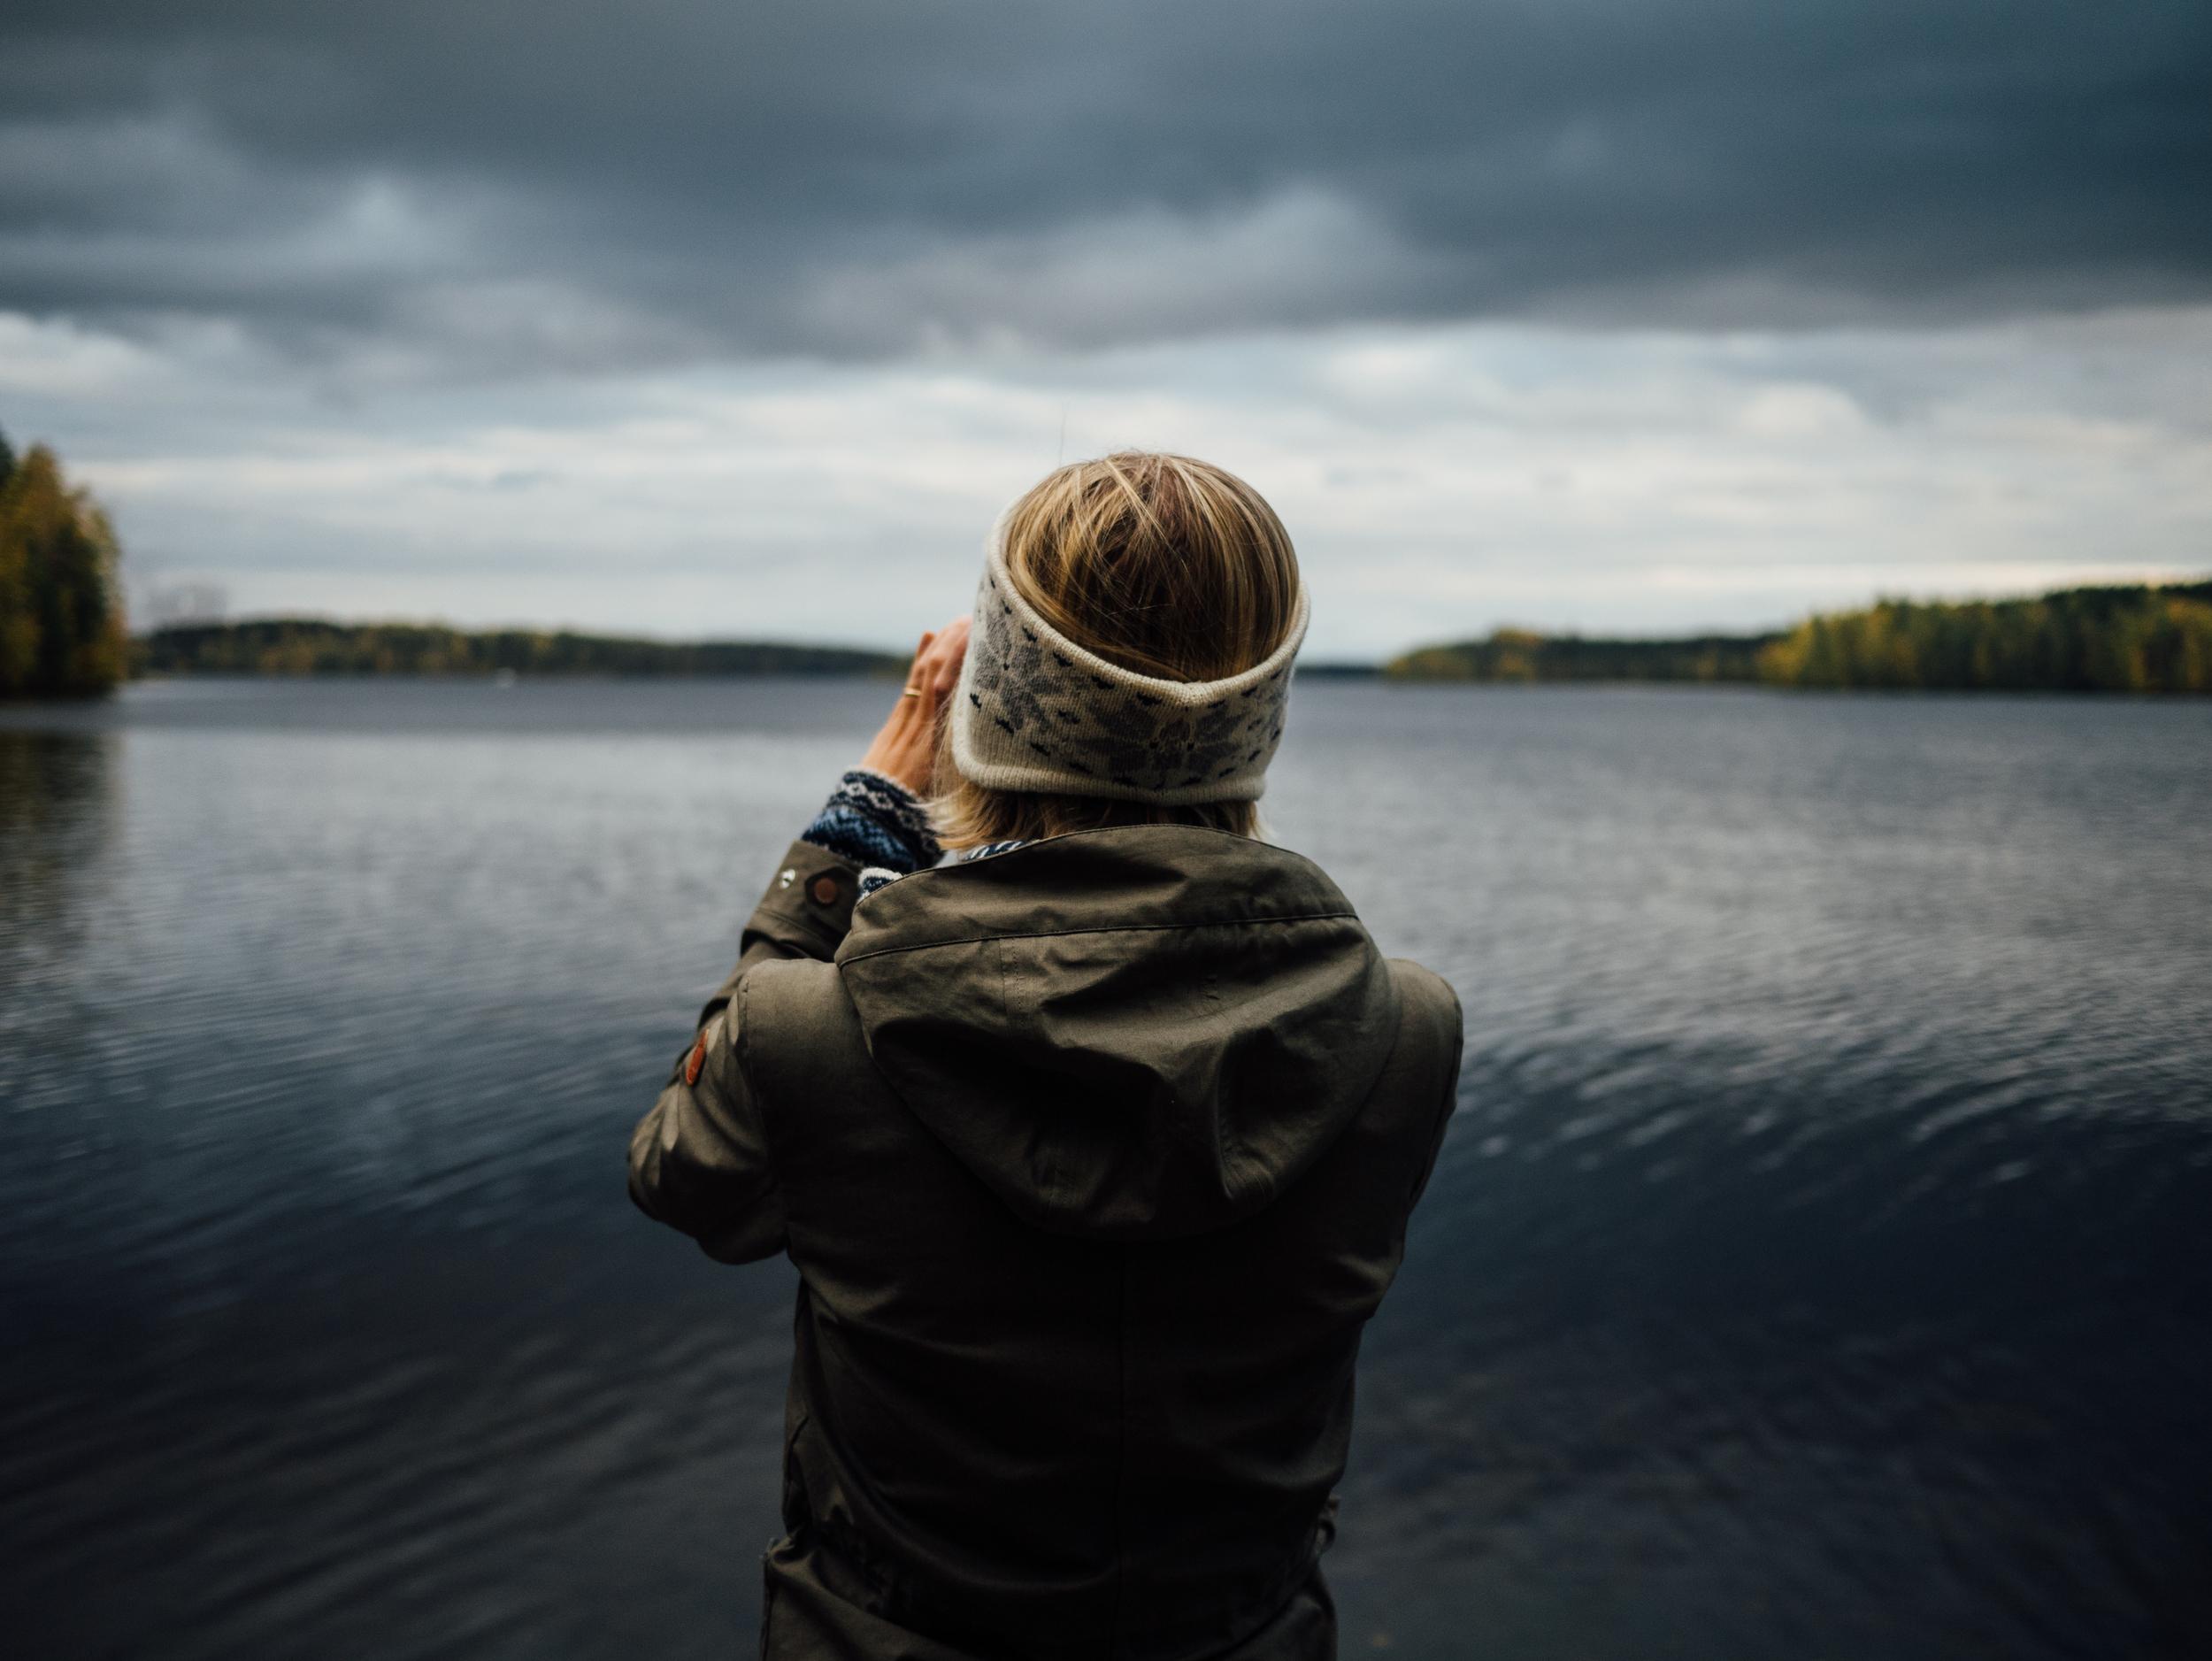 Heinola, Finland, October 2015